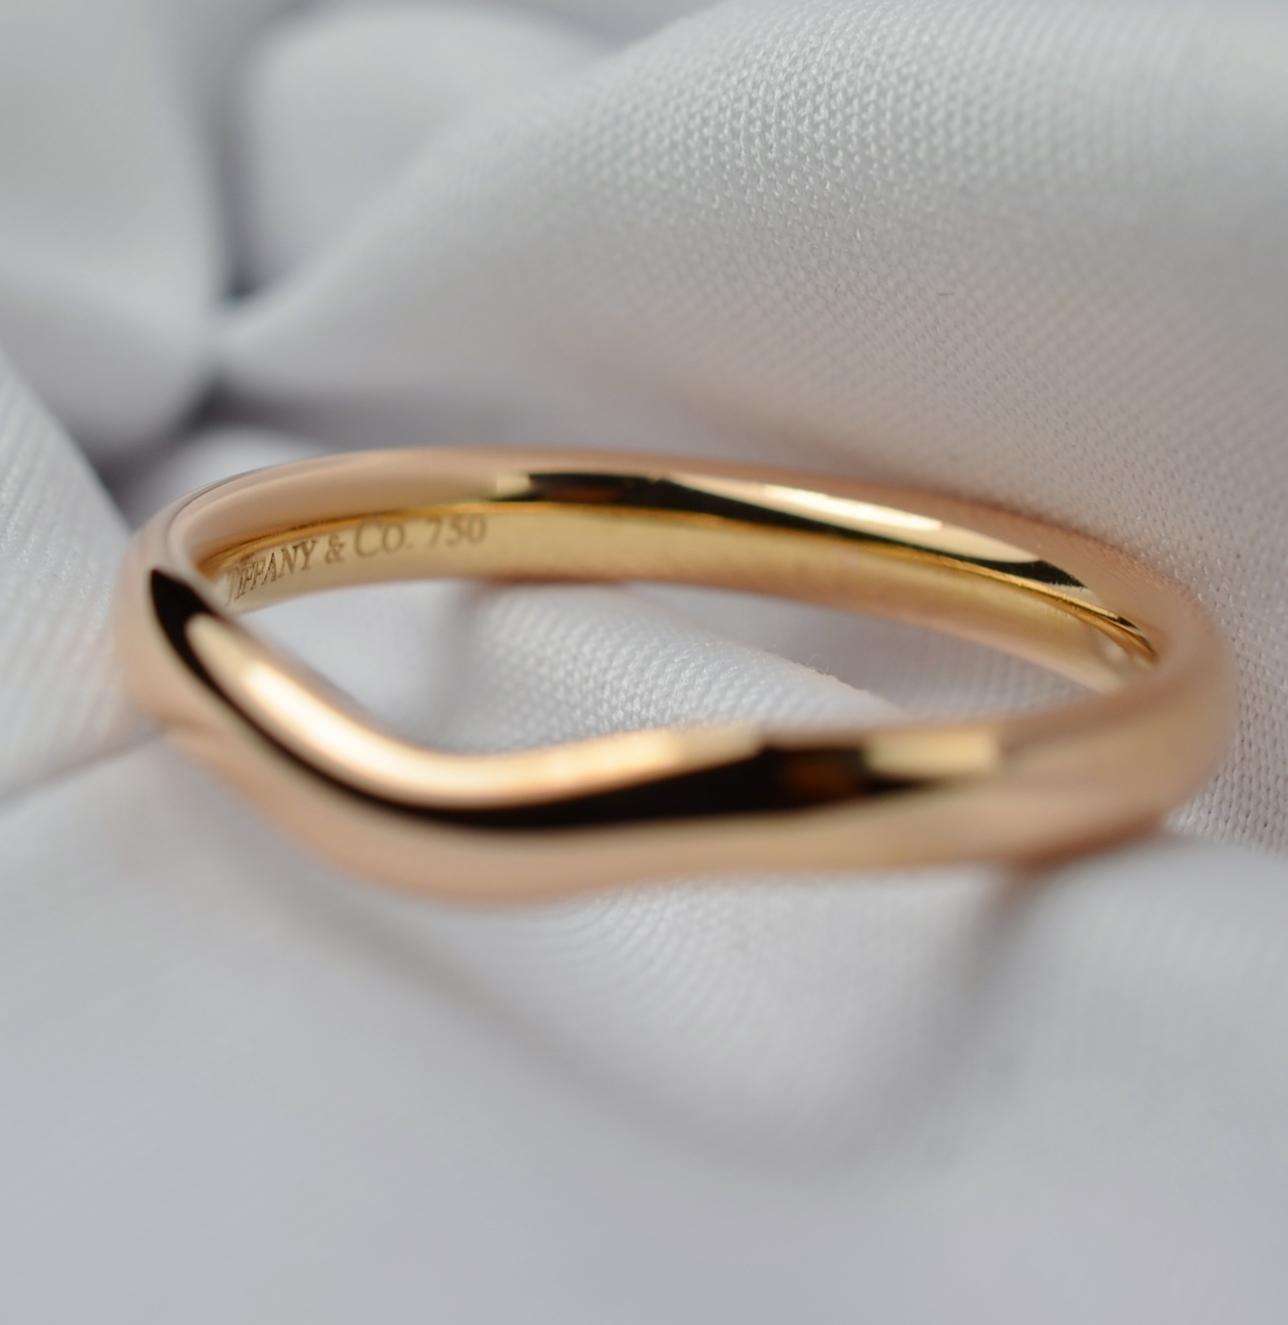 Tiffany Co Elsa Peretti 18k Rose Gold Curved Wedding Band